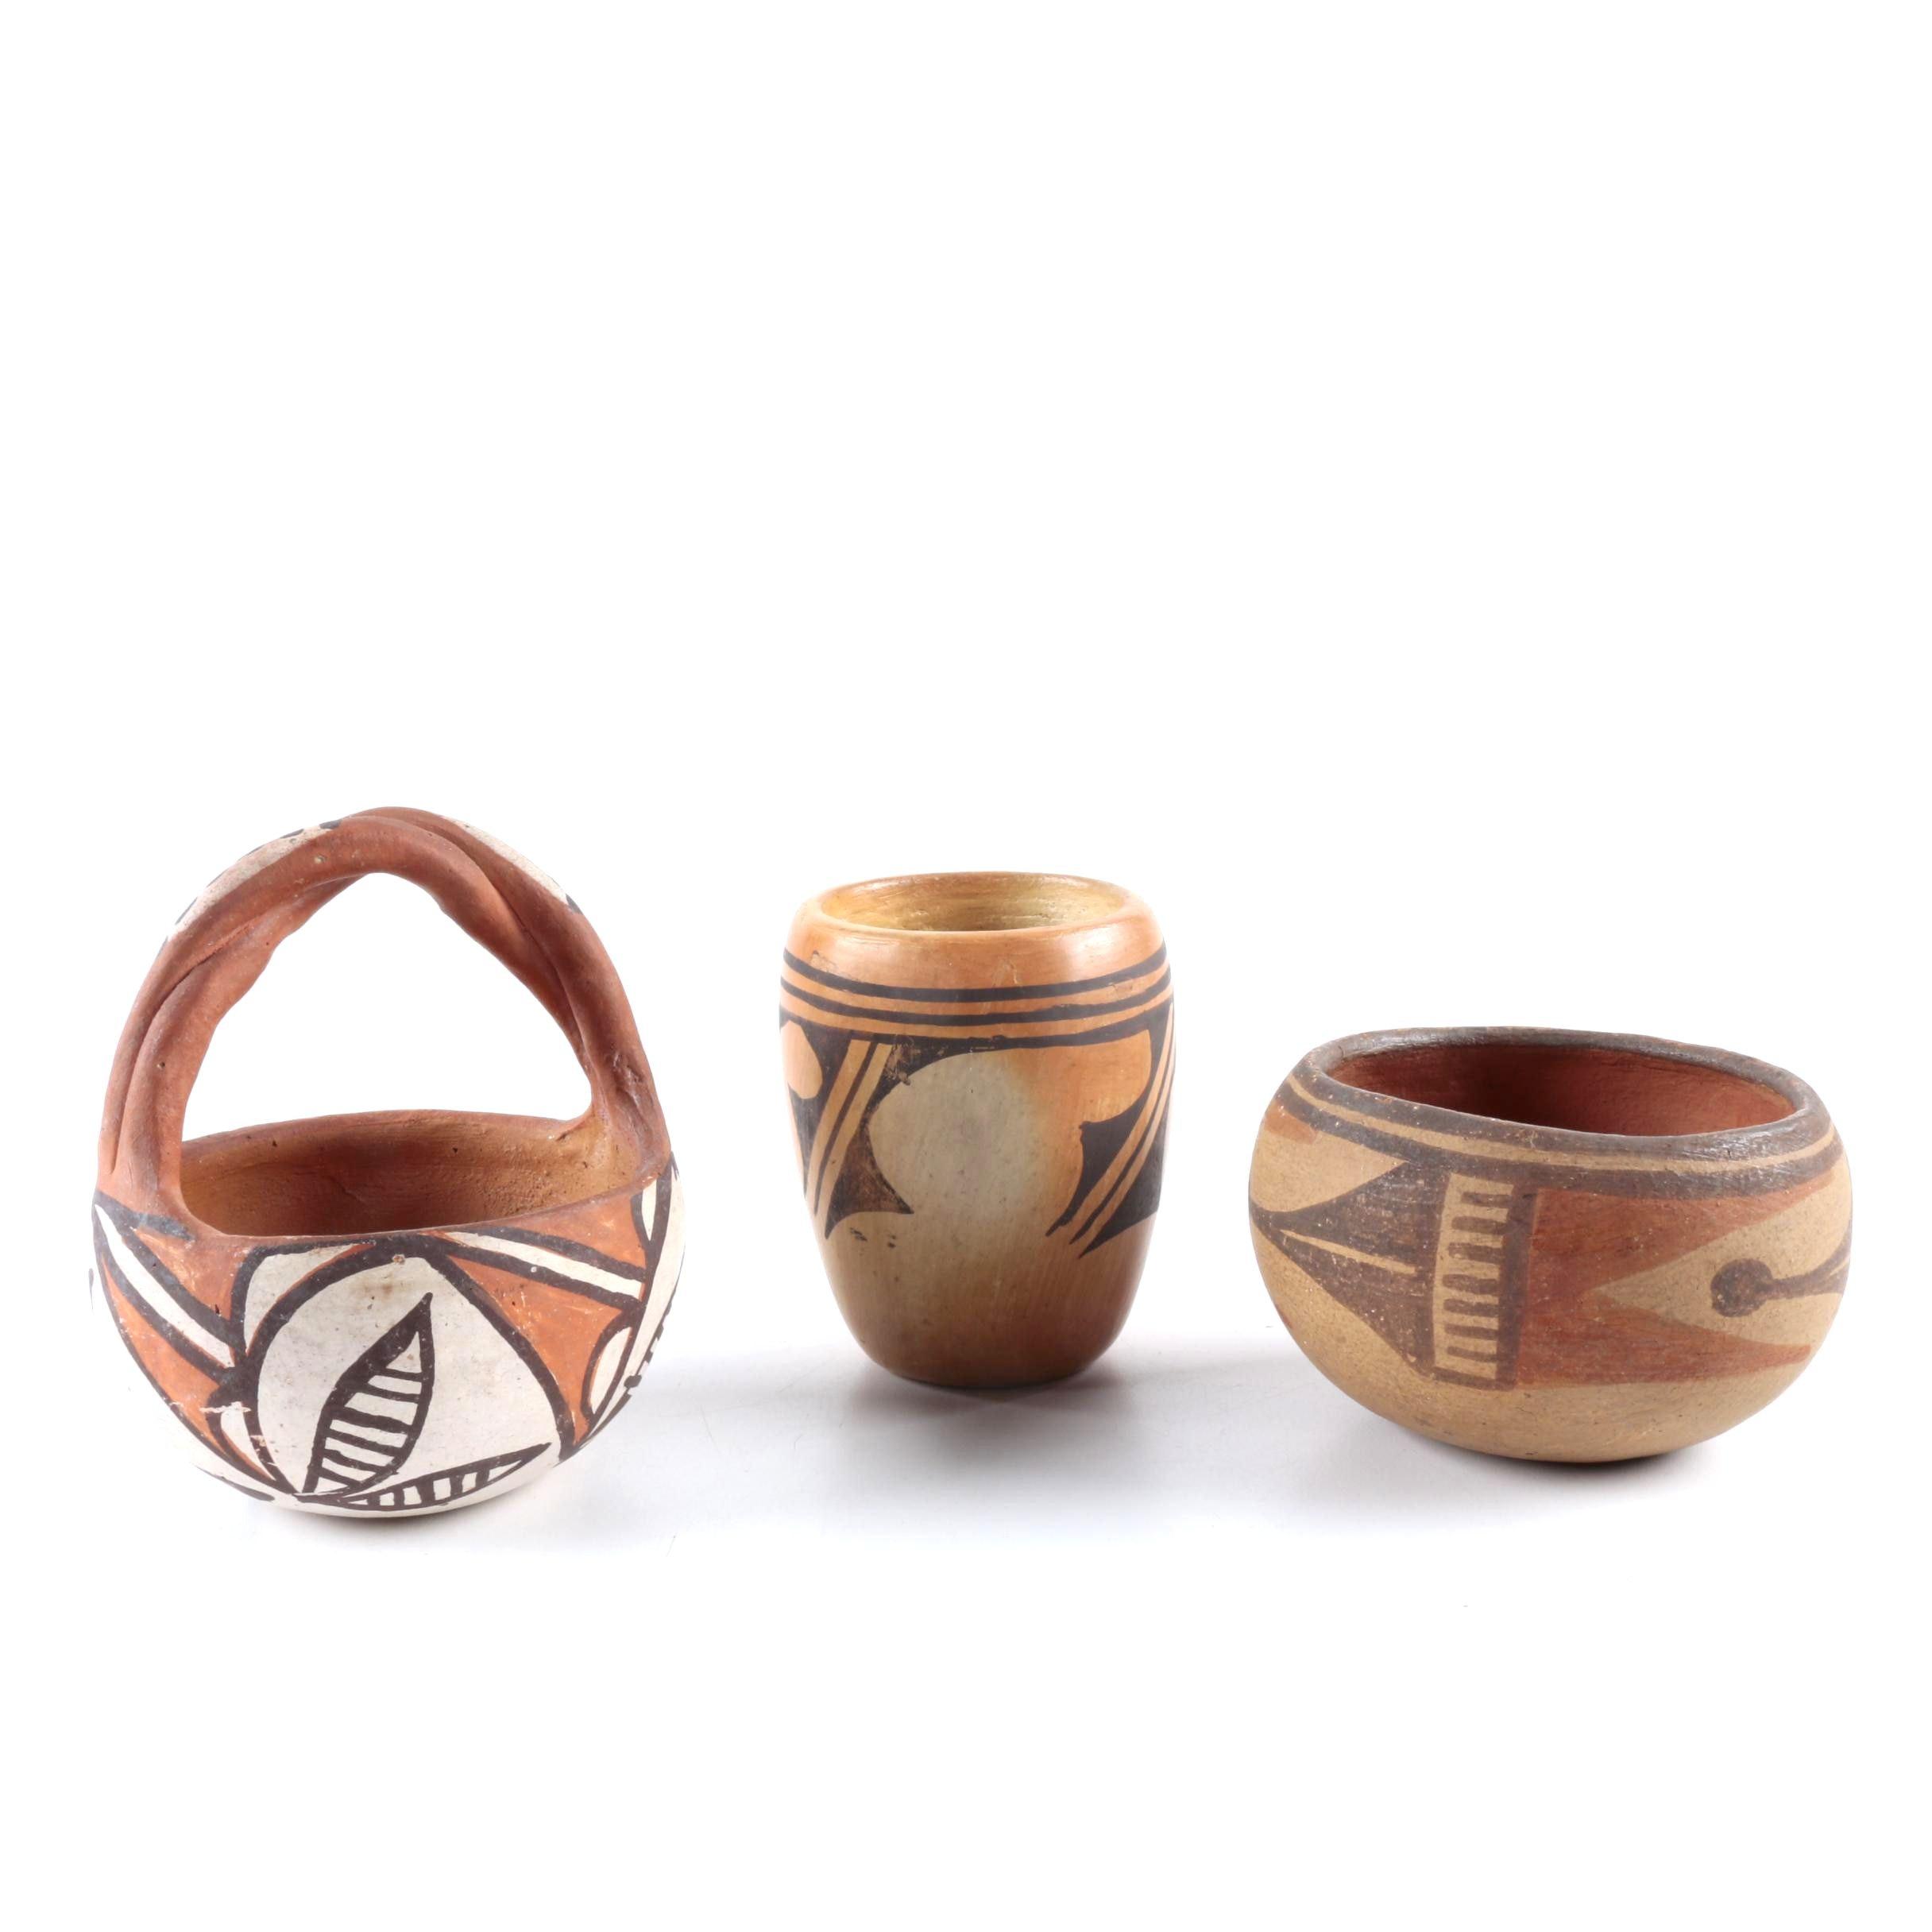 Acoma Native American-Style Pottery